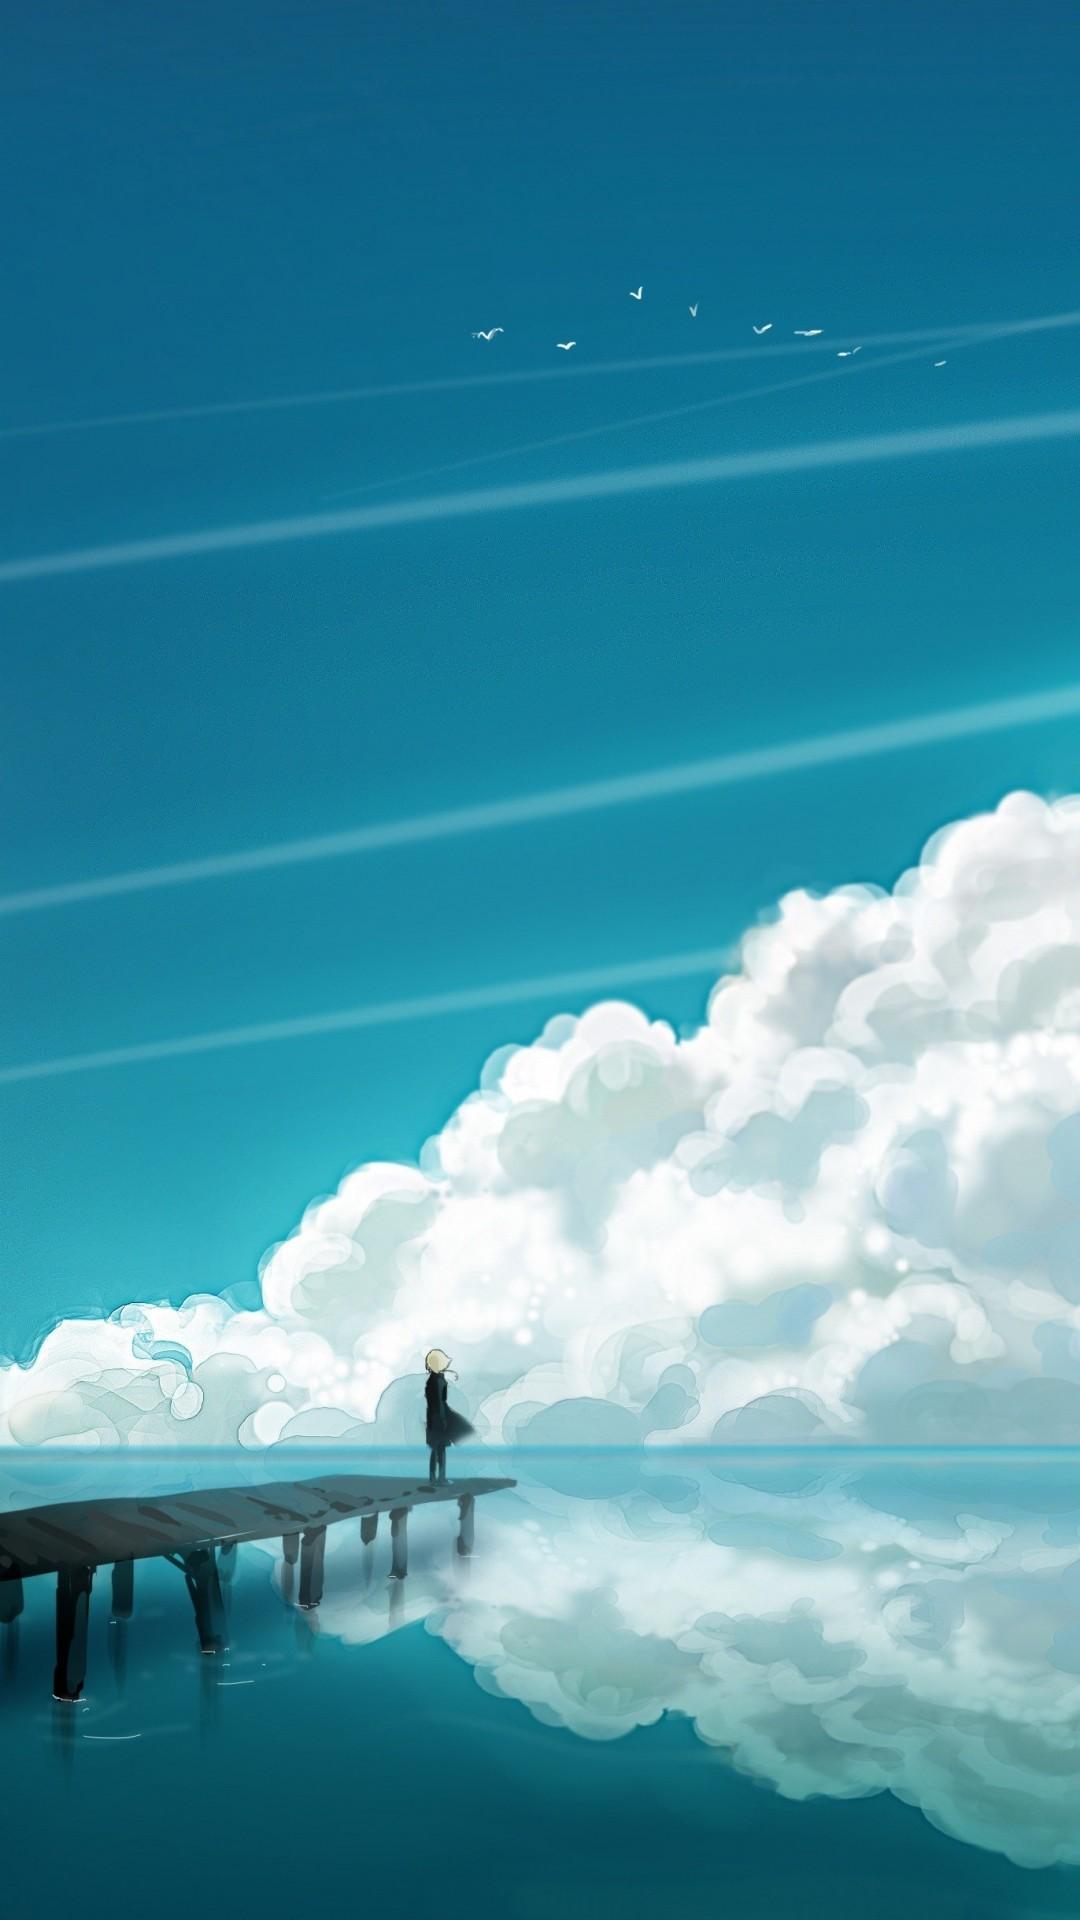 Preview wallpaper clouds, sky, bridge, people, reflection, sea 1080×1920